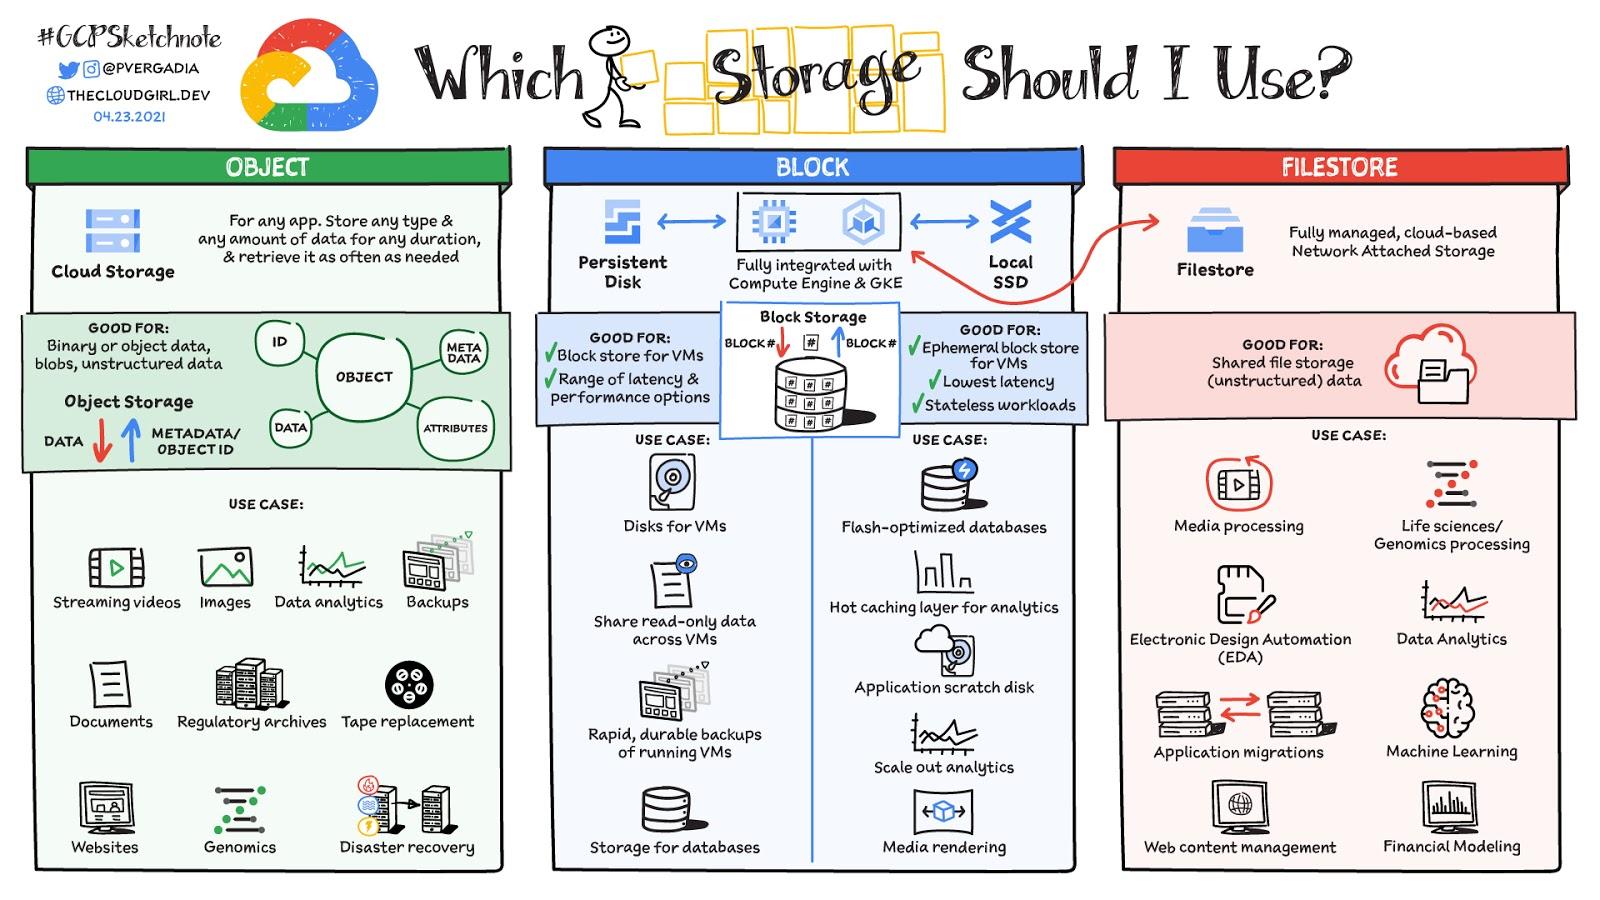 storage to use